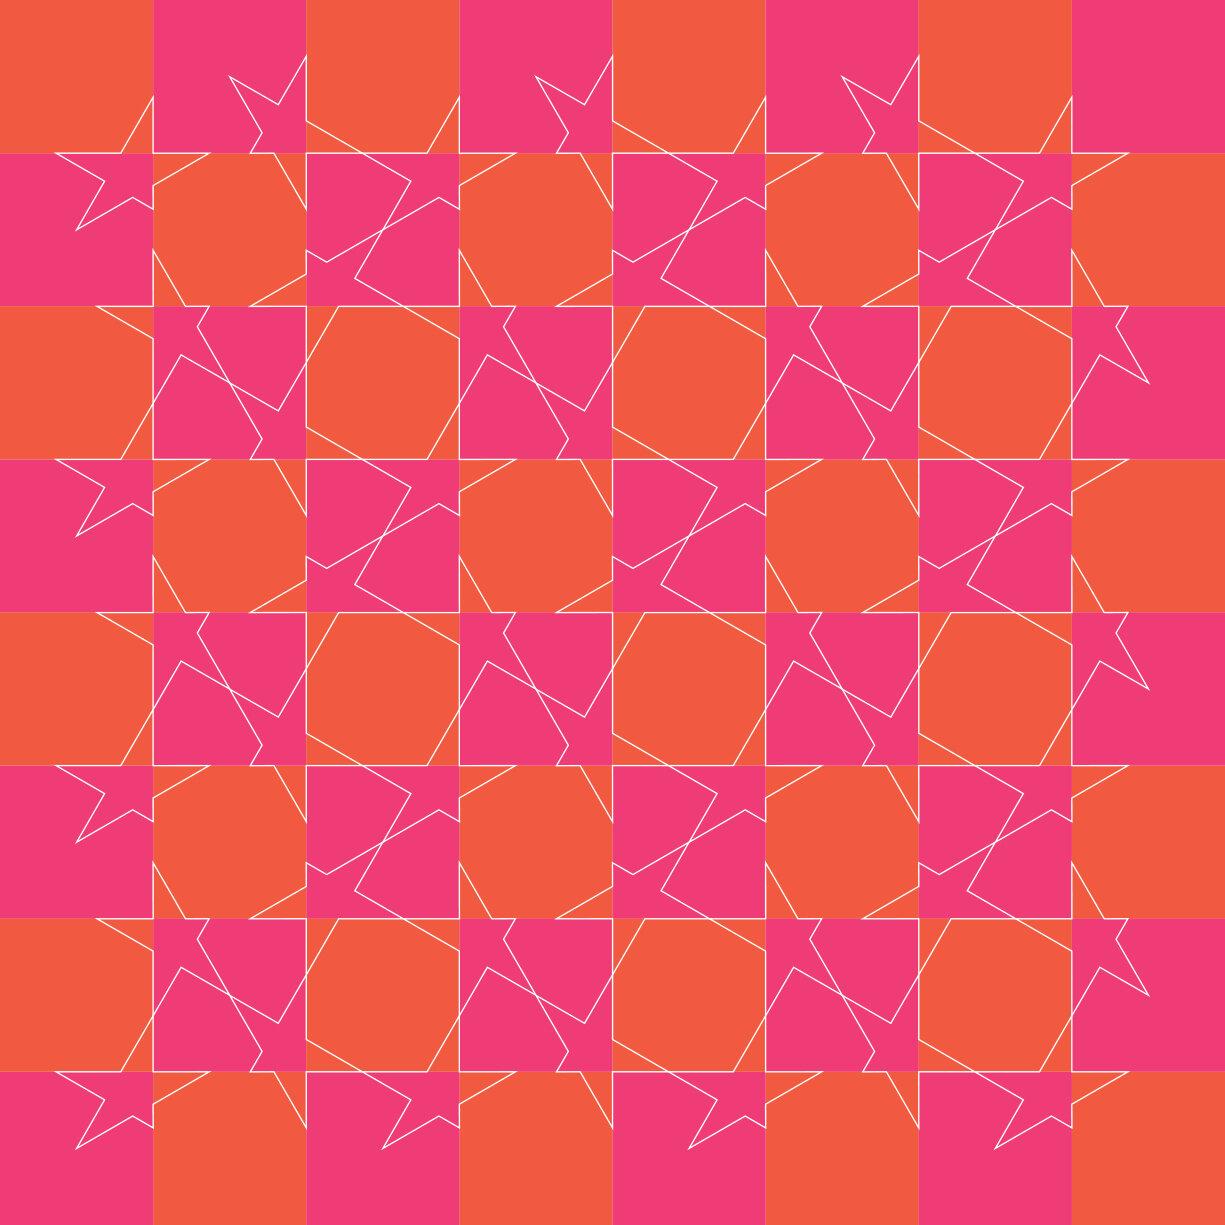 Starry Squares.jpg